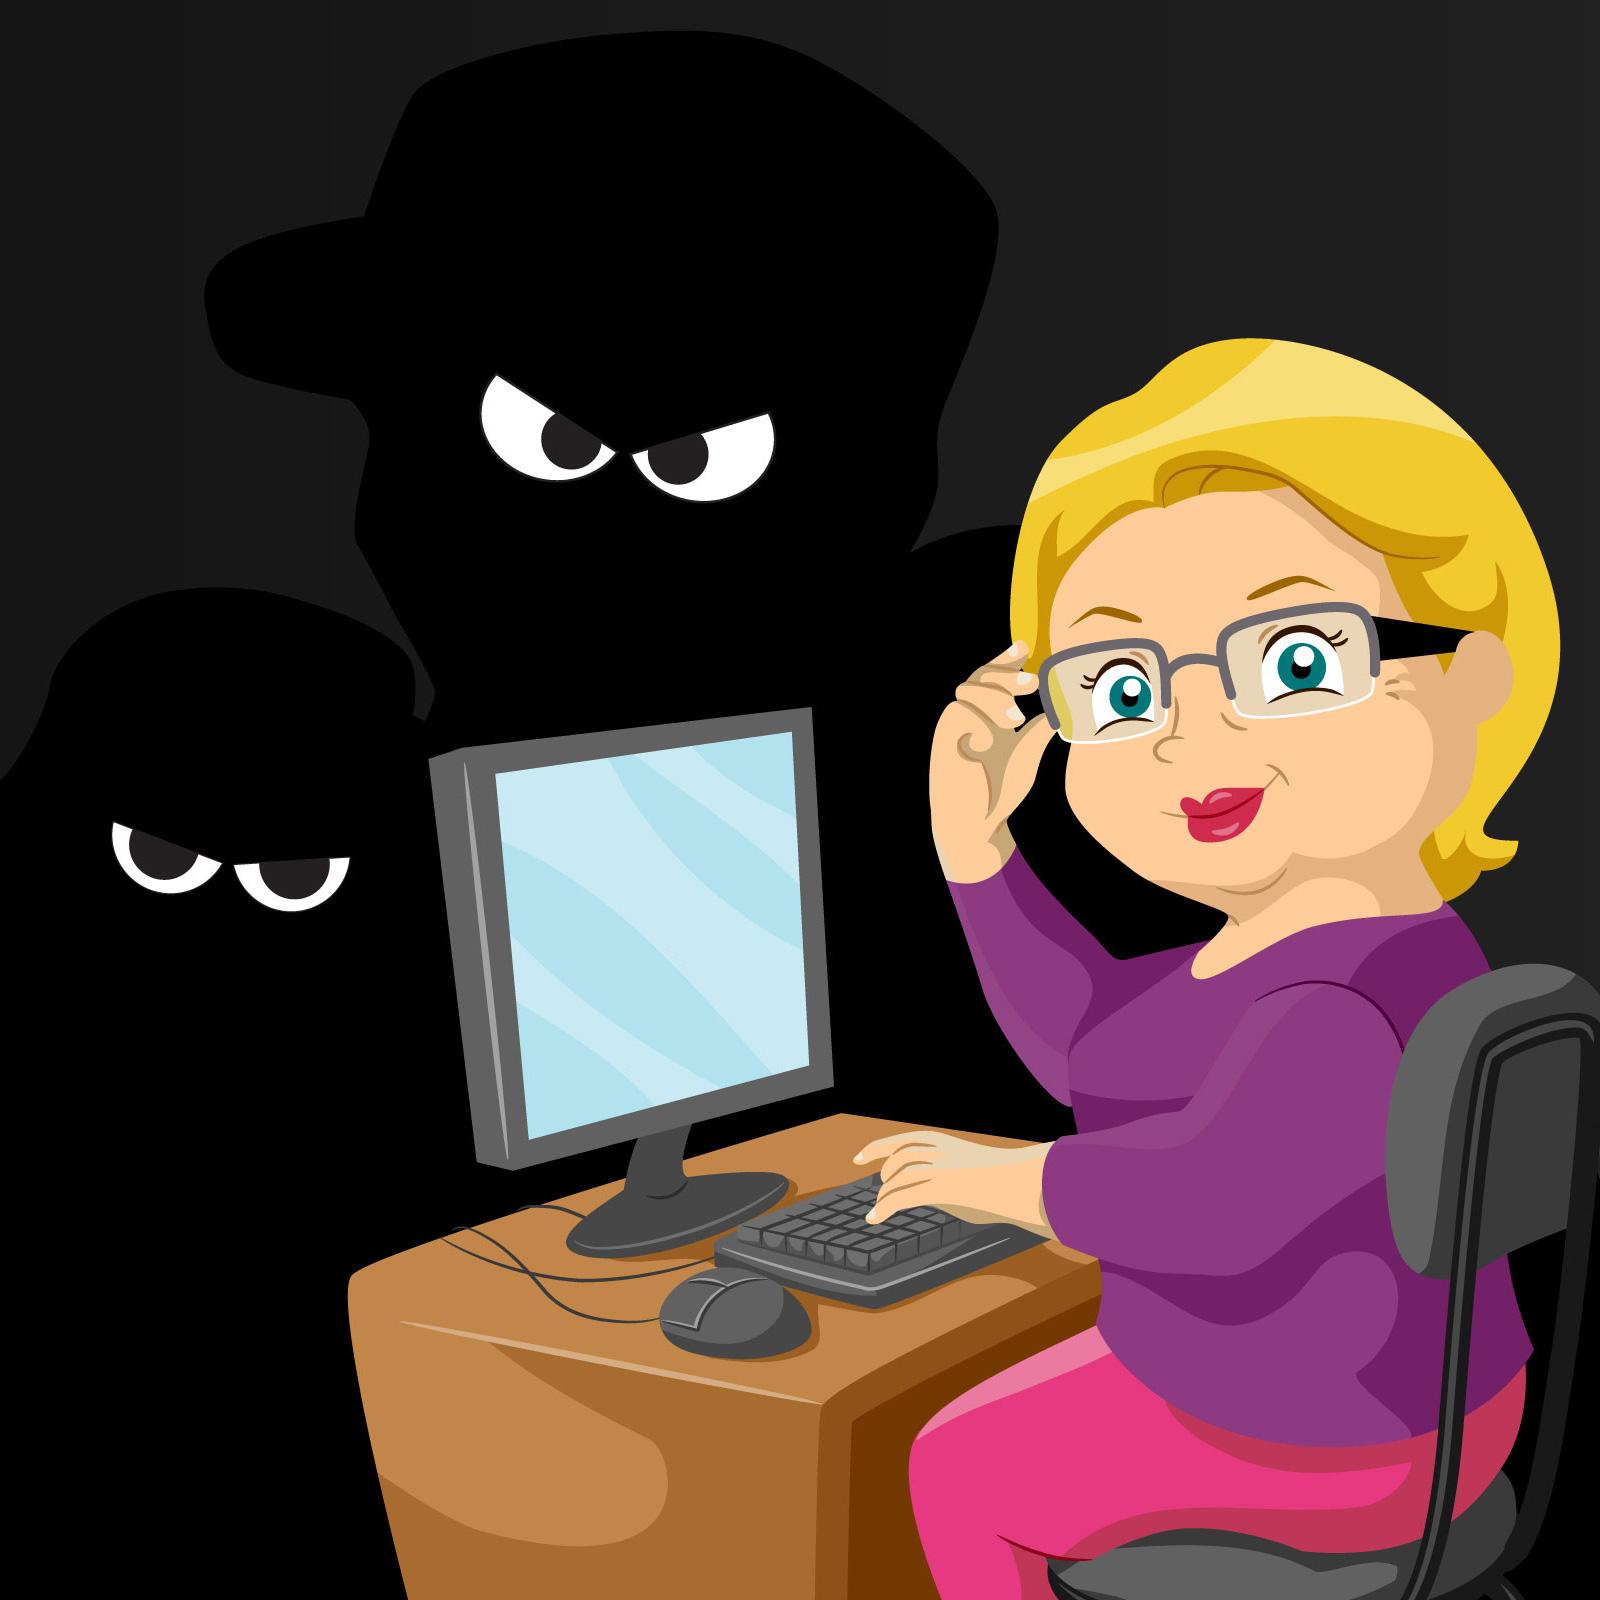 Online Habits of Over-55s